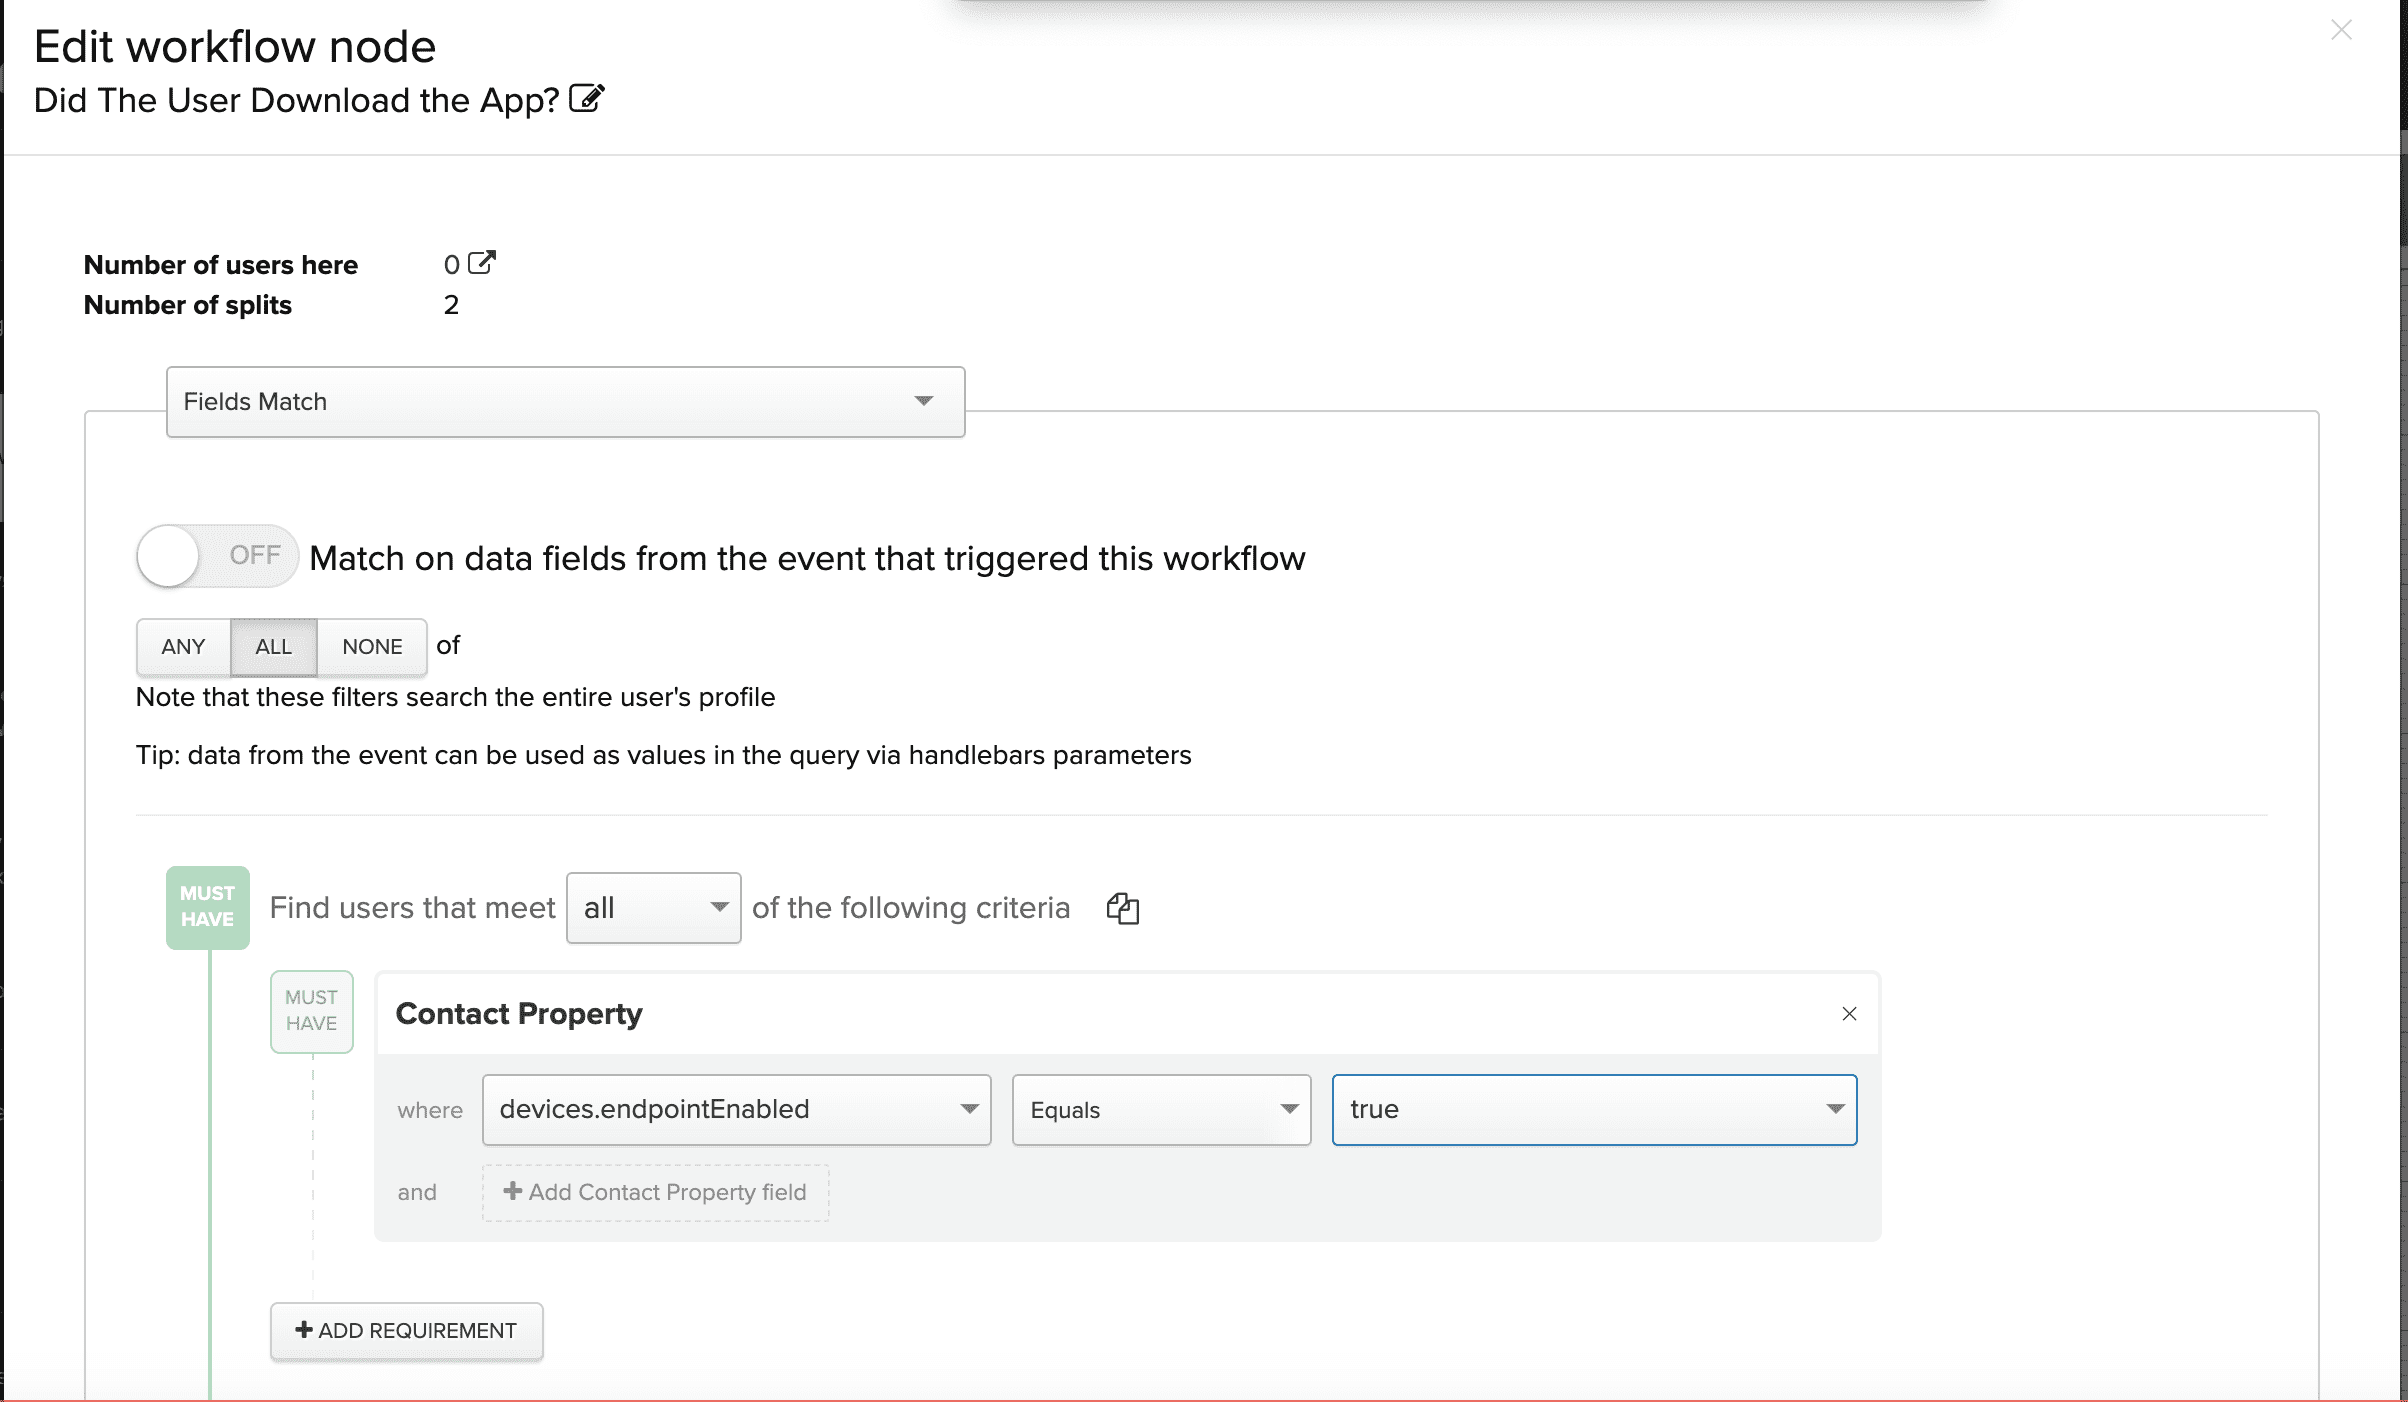 Edit workflow node screenshot